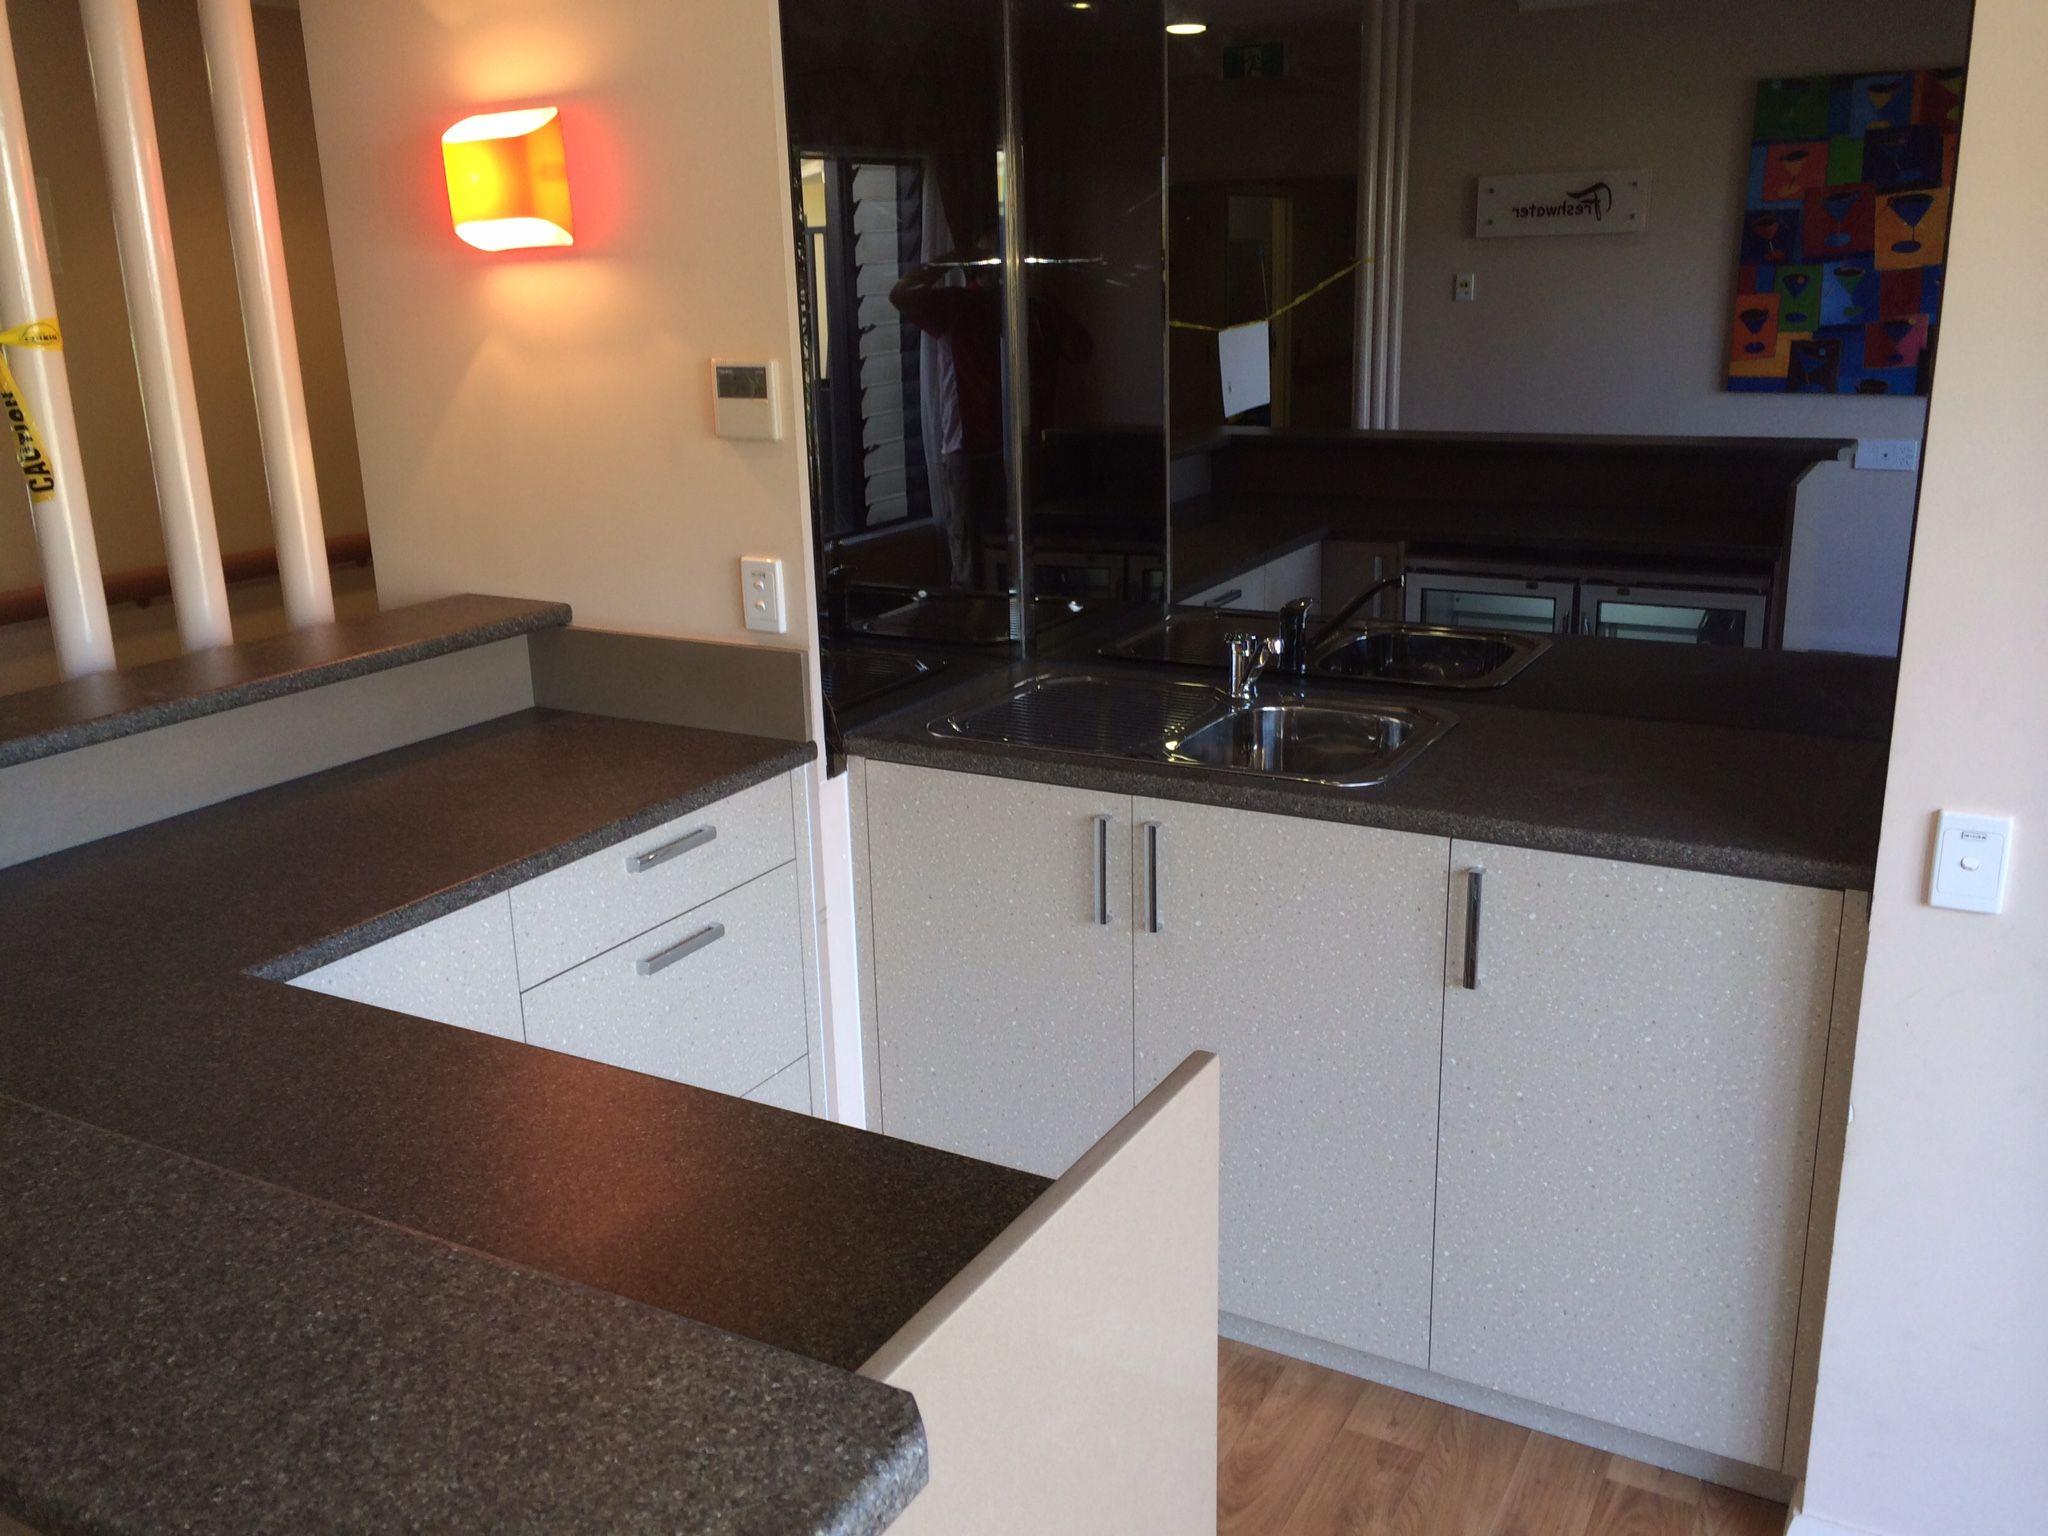 Laminate bench top, melamine doors and drawer fronts, mirror splashback